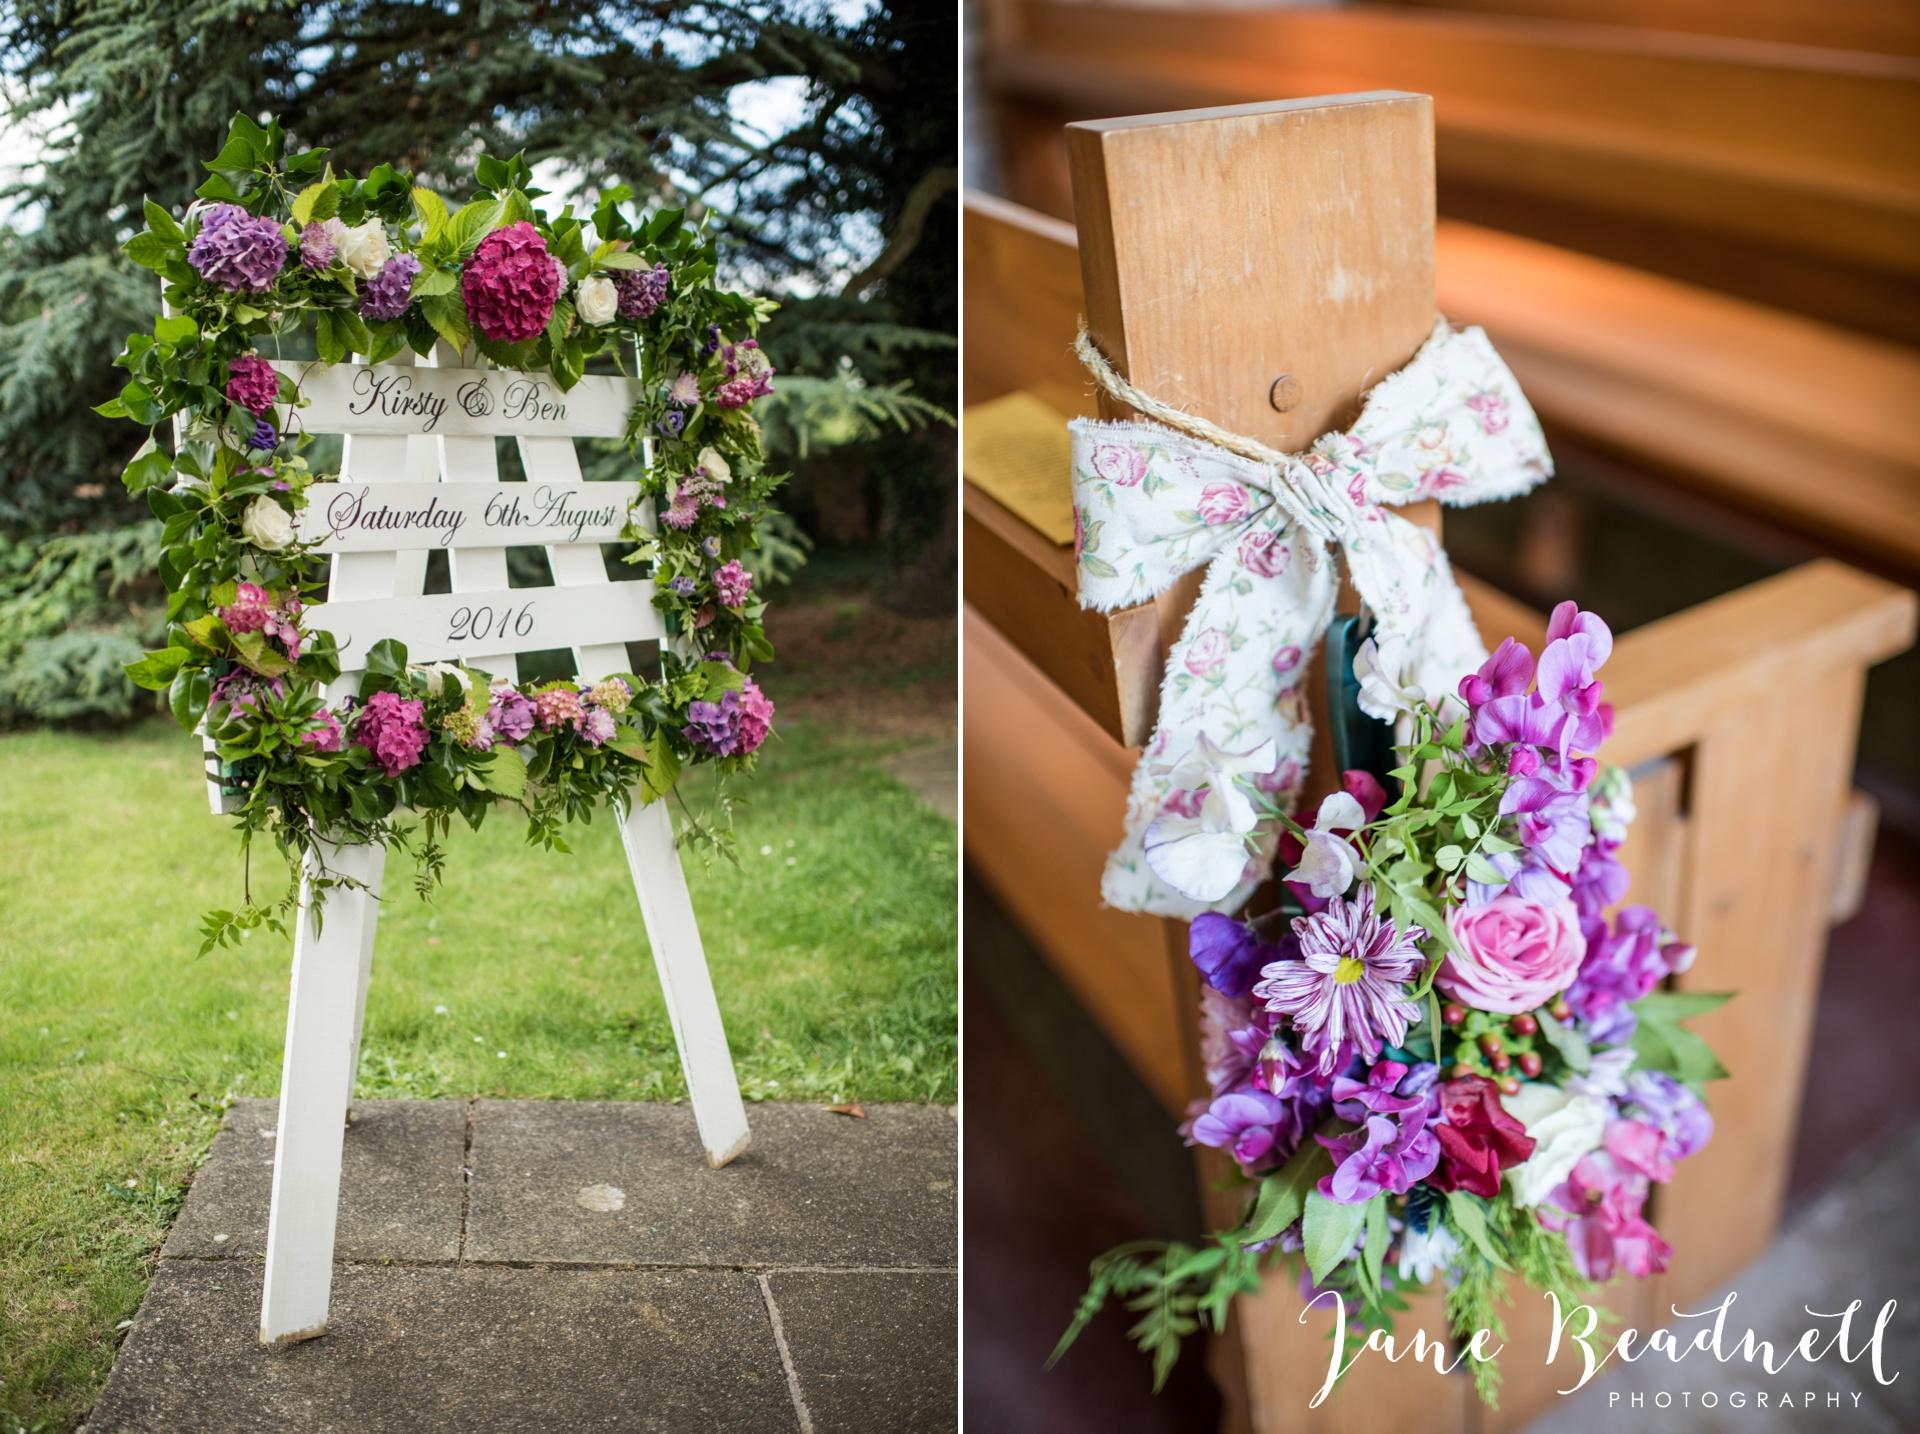 yorkshire-fine-art-wedding-photographer-jane-beadnell-photography-poppleton-york_0023